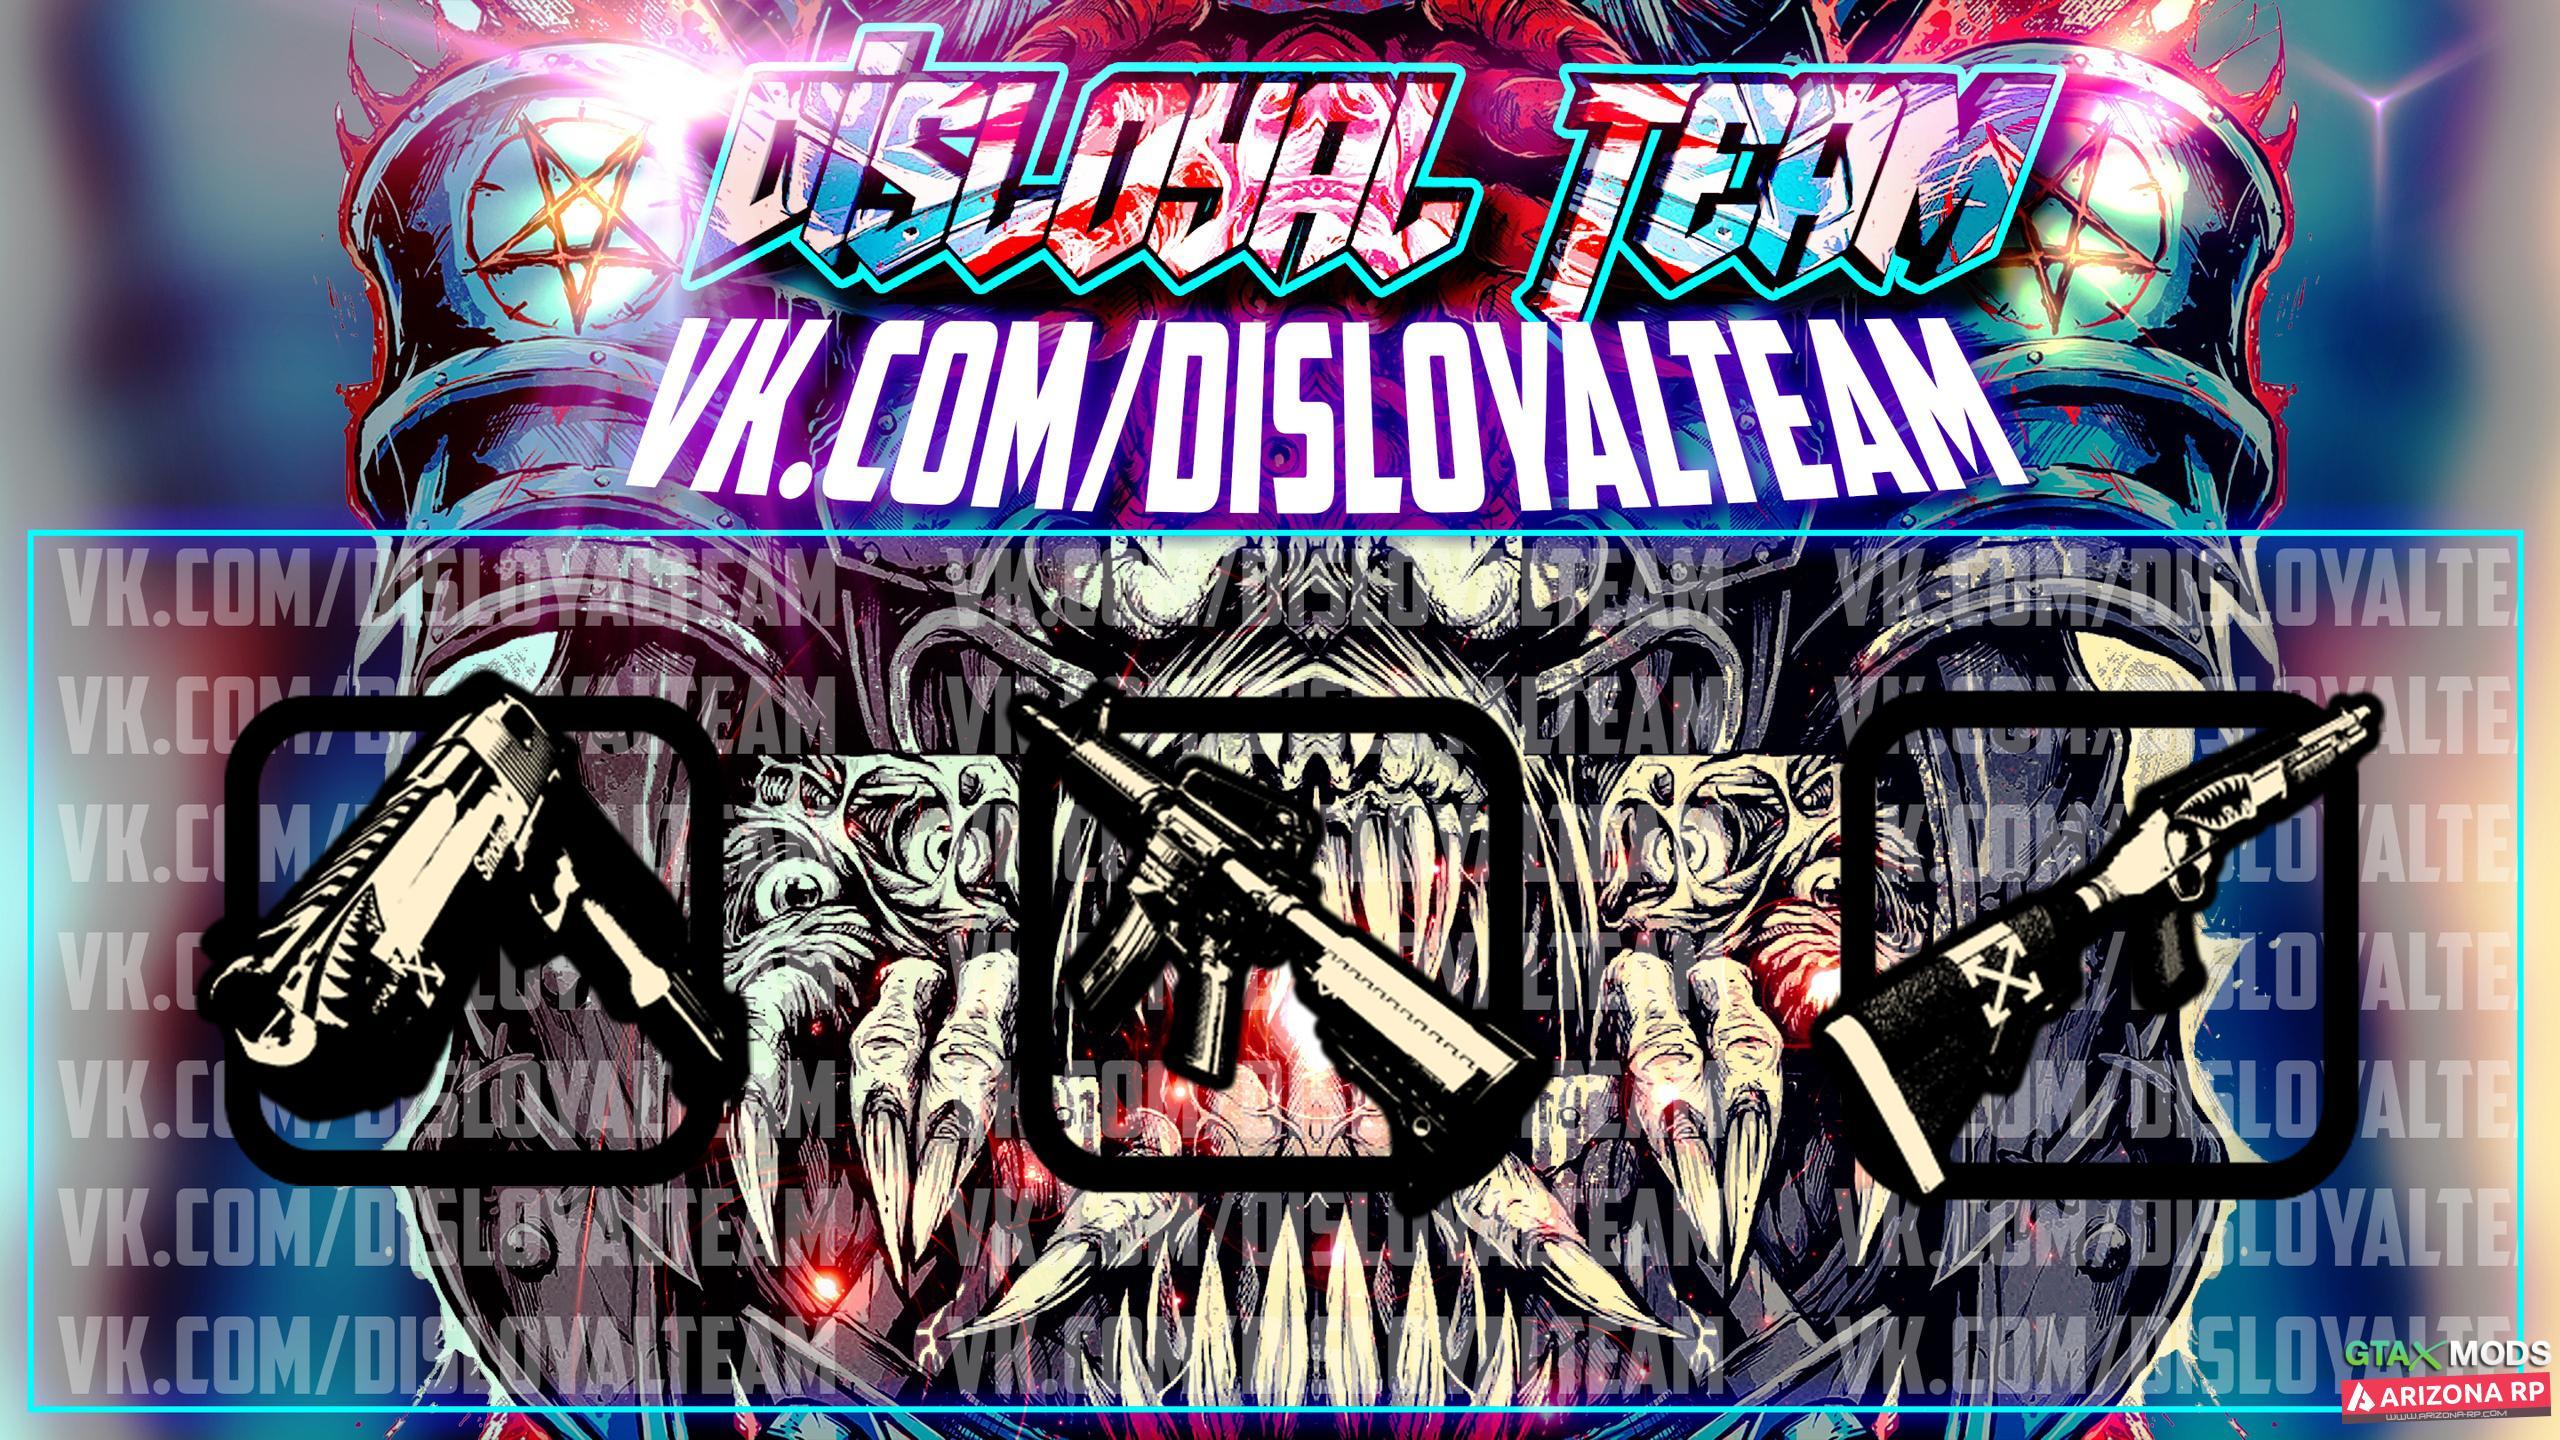 Gunpack | Disloyal_Team sliv Private